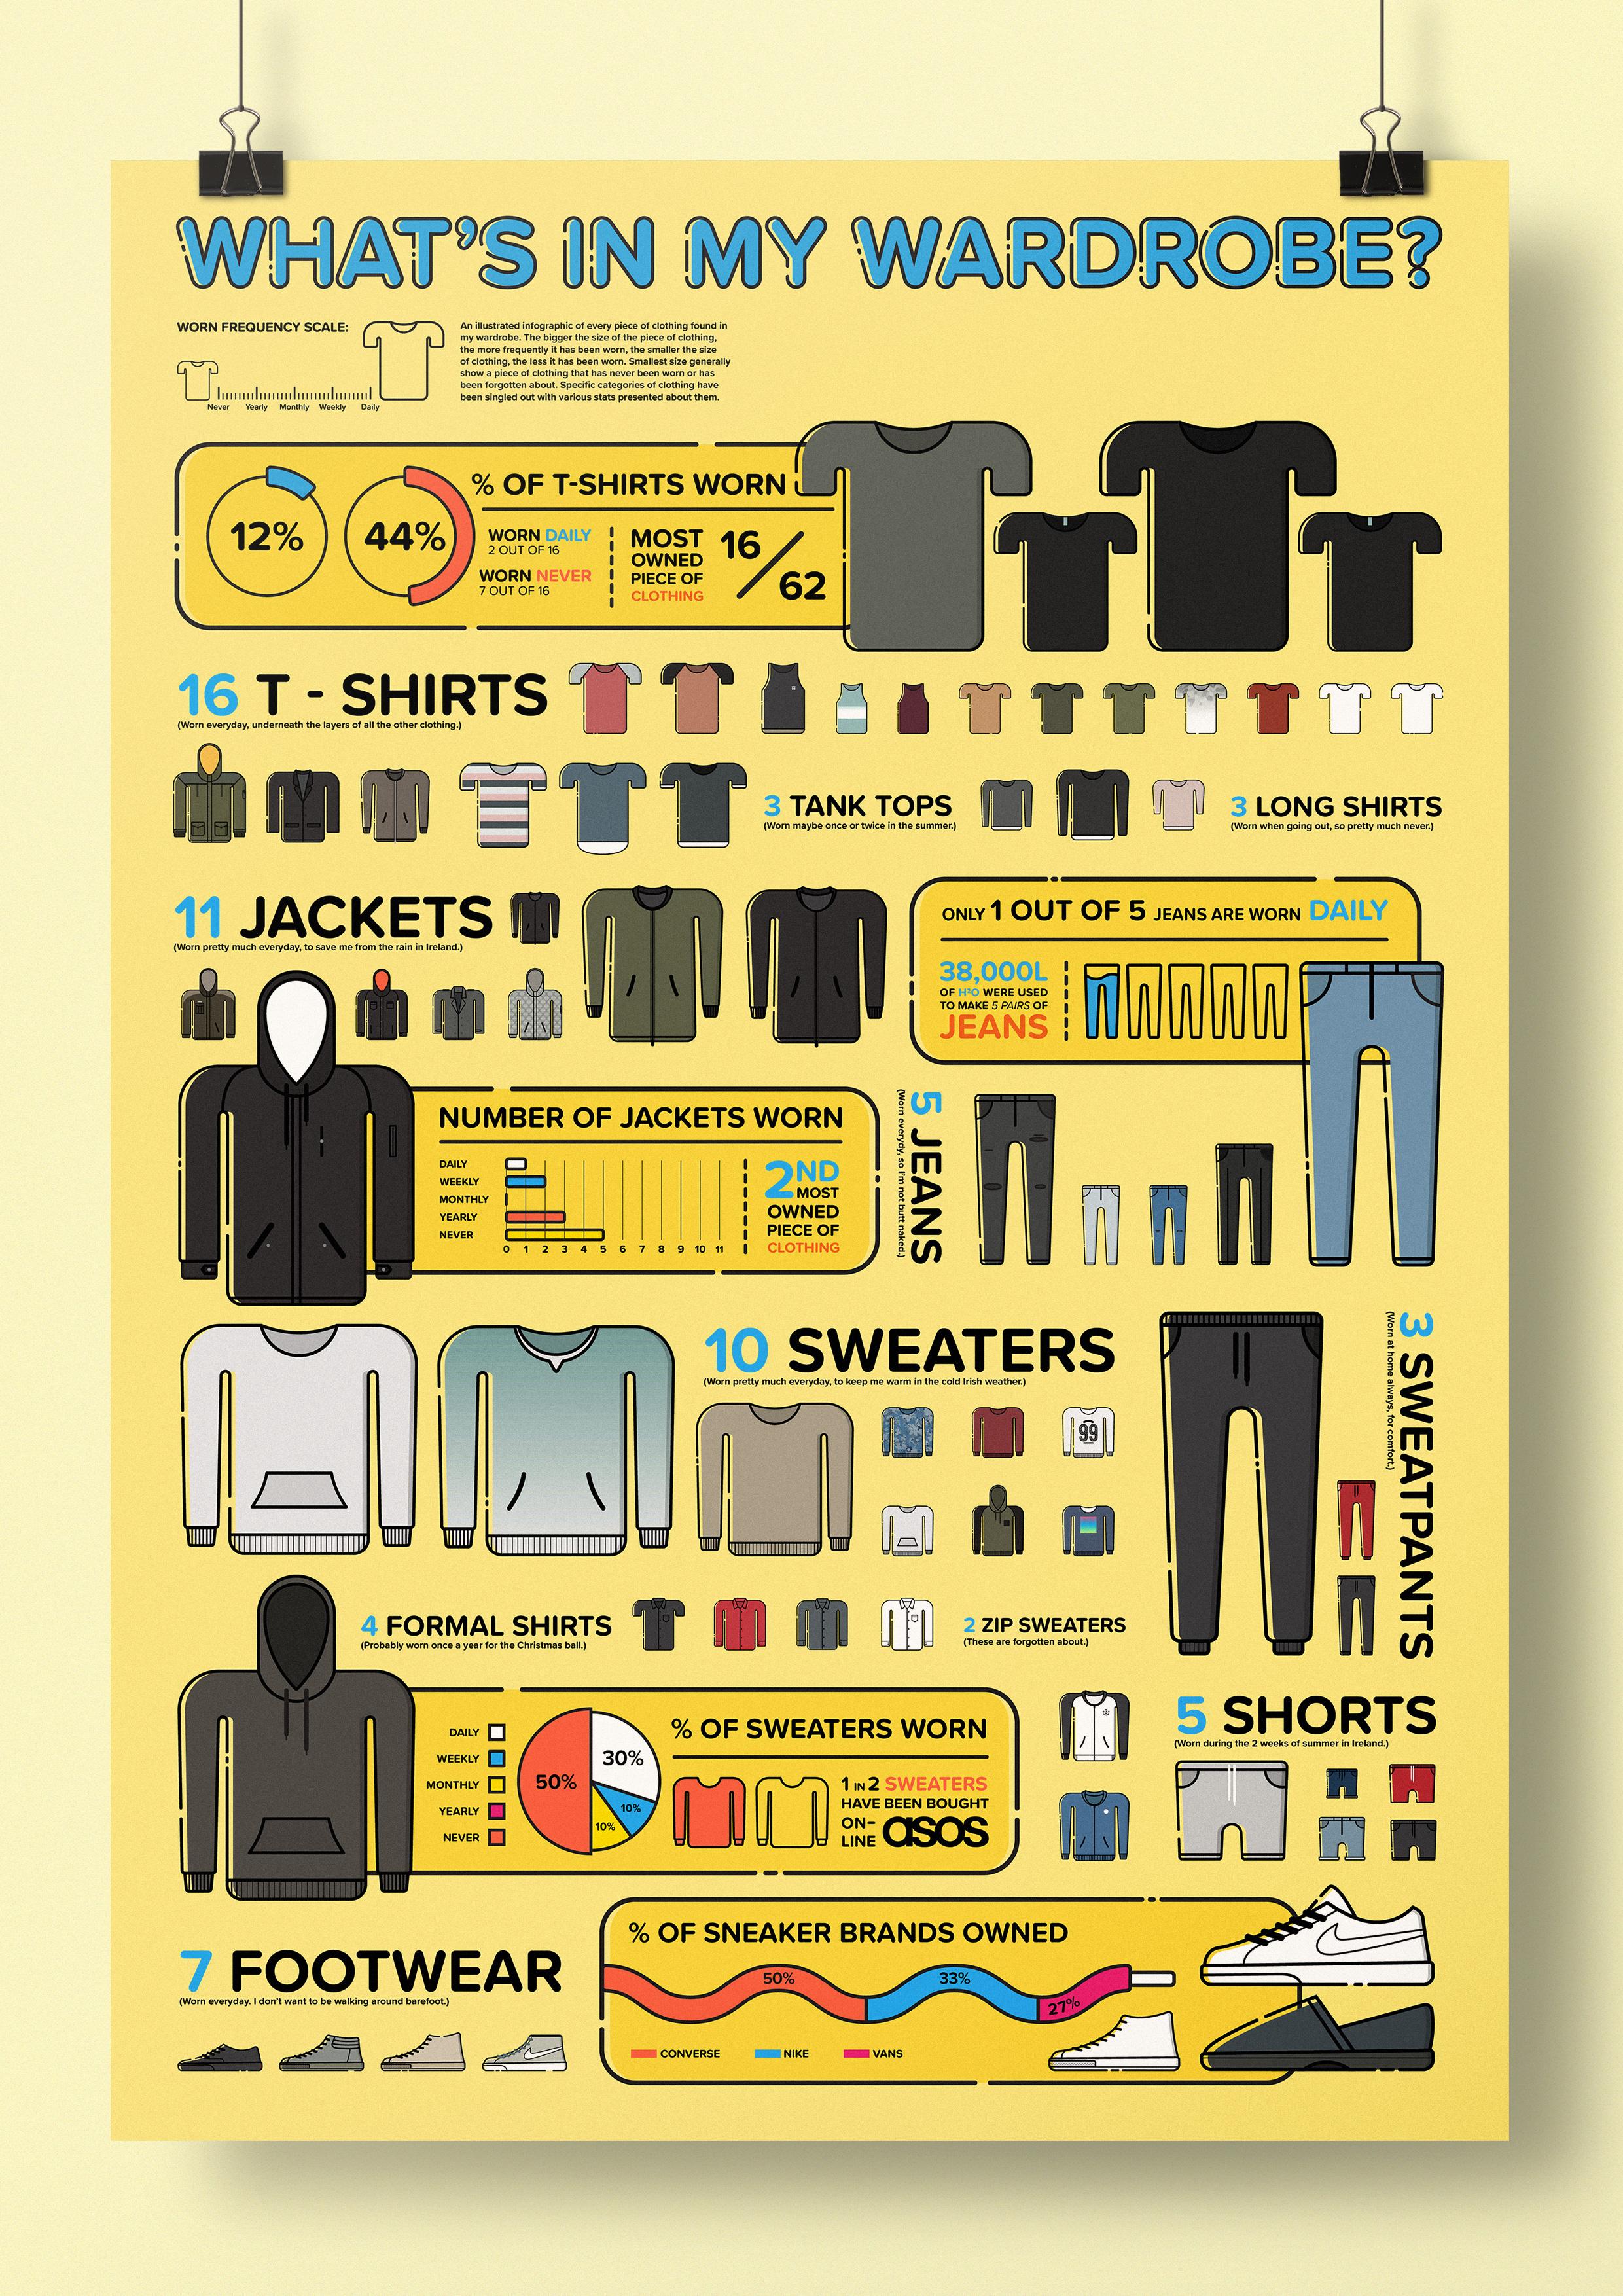 wardrobe4.jpg